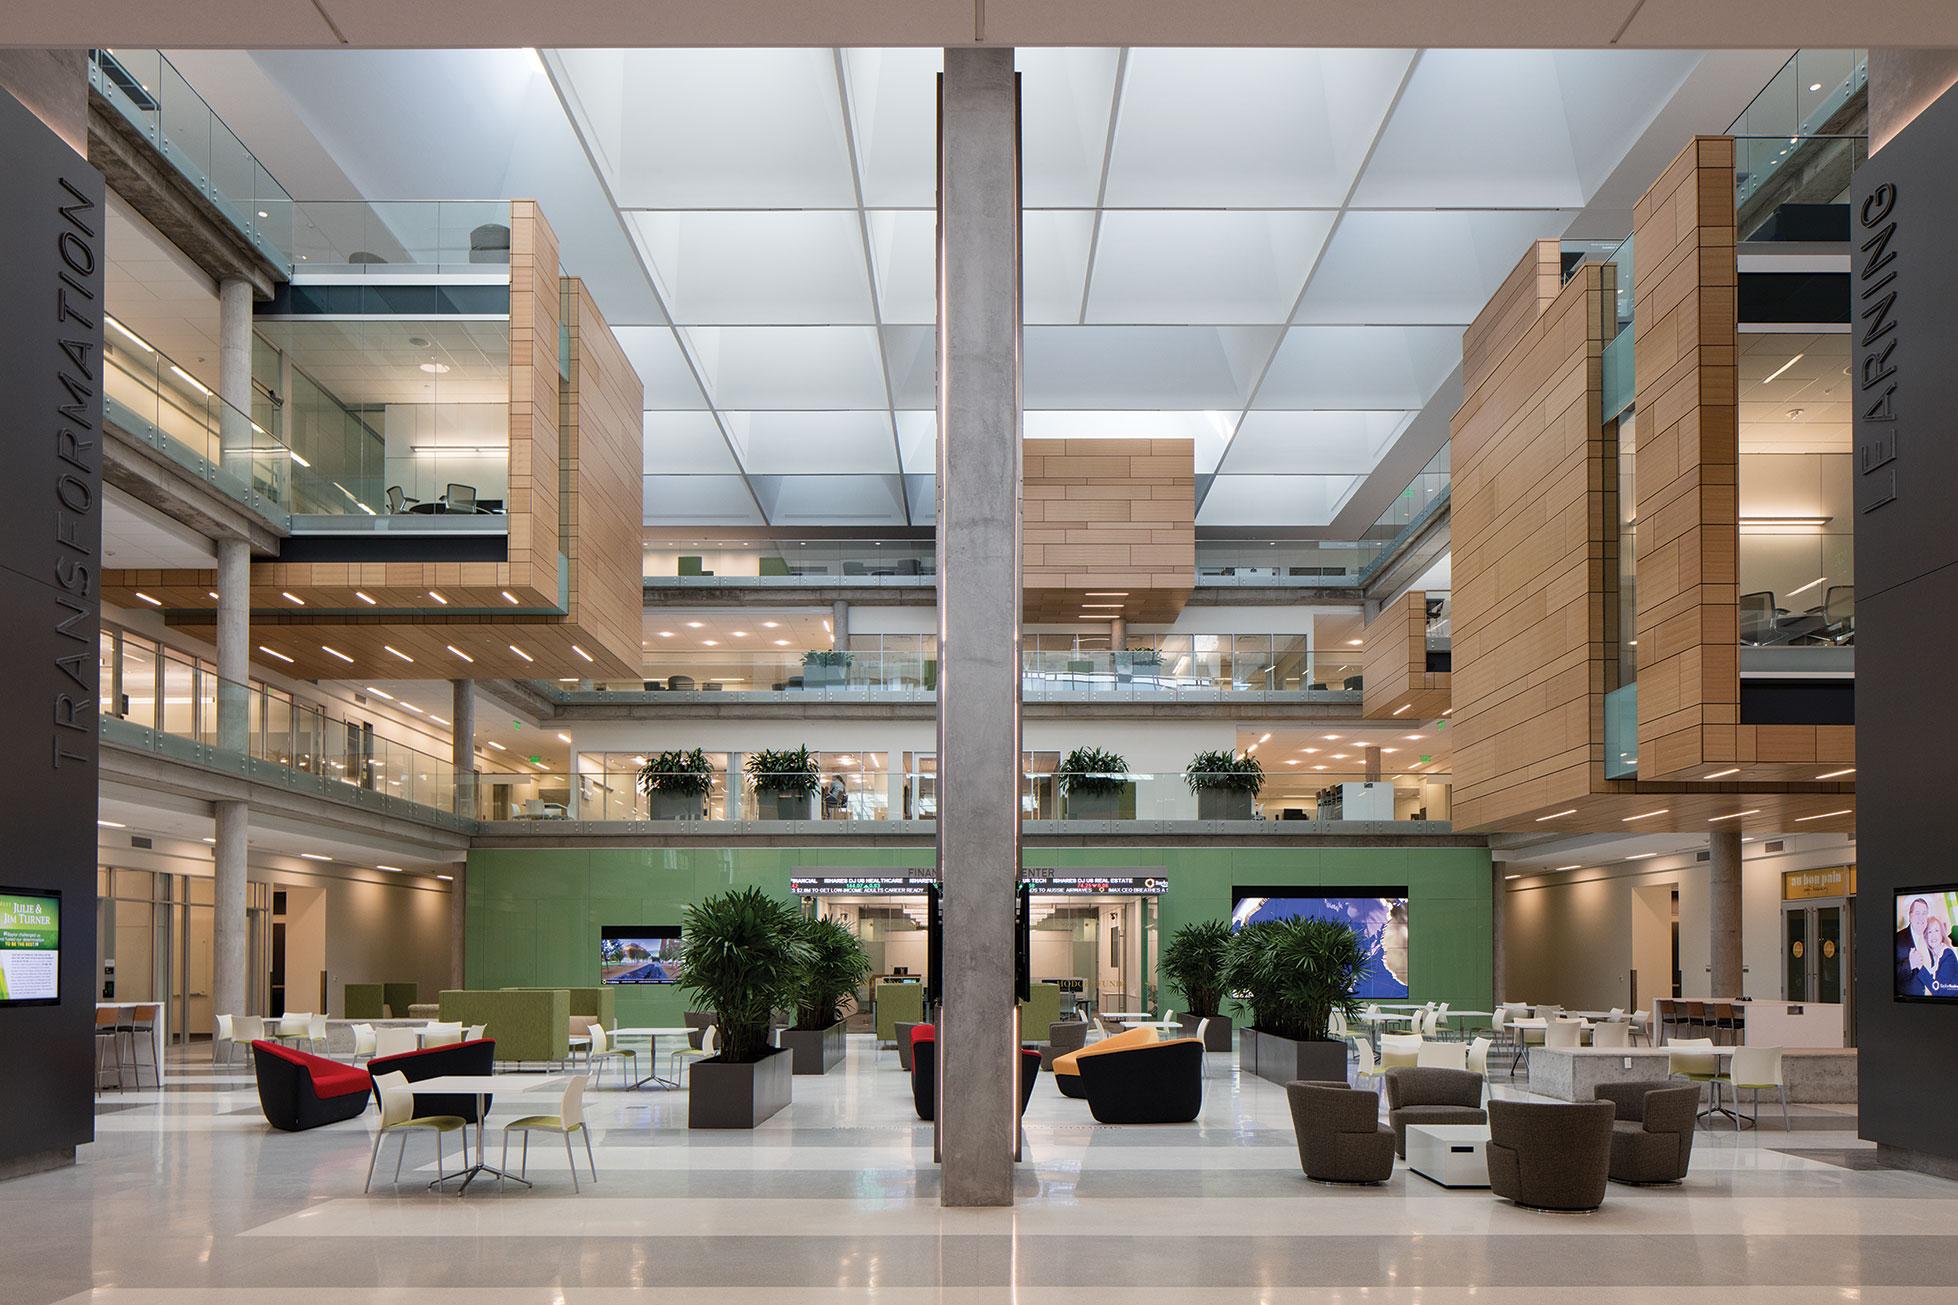 2017 al design awards baylor university paul l foster - Interior design schools in alabama ...